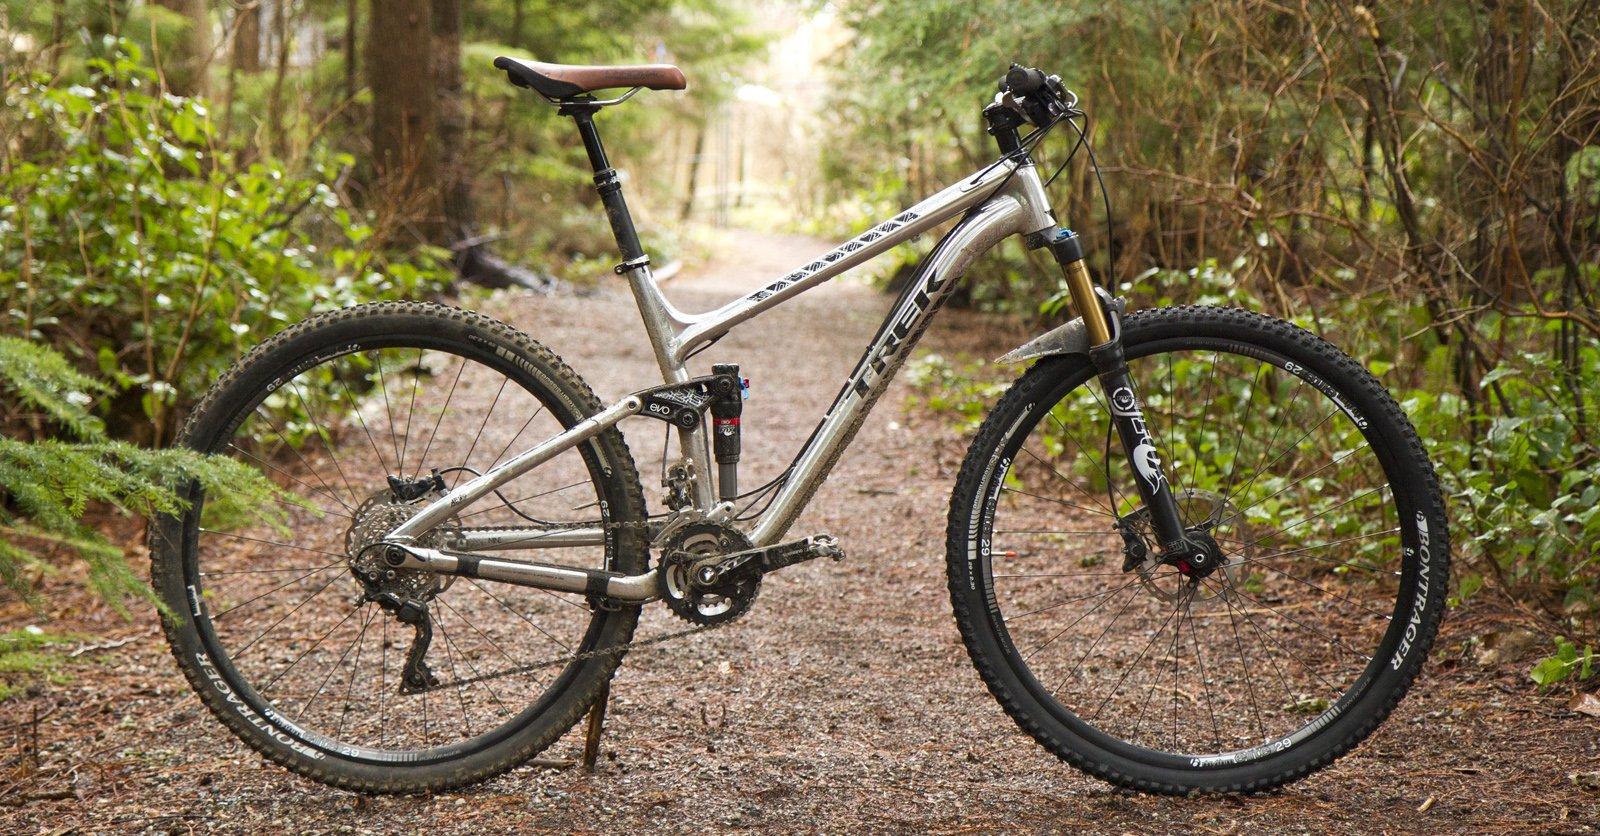 2014 Trek Fuel EX 9 29